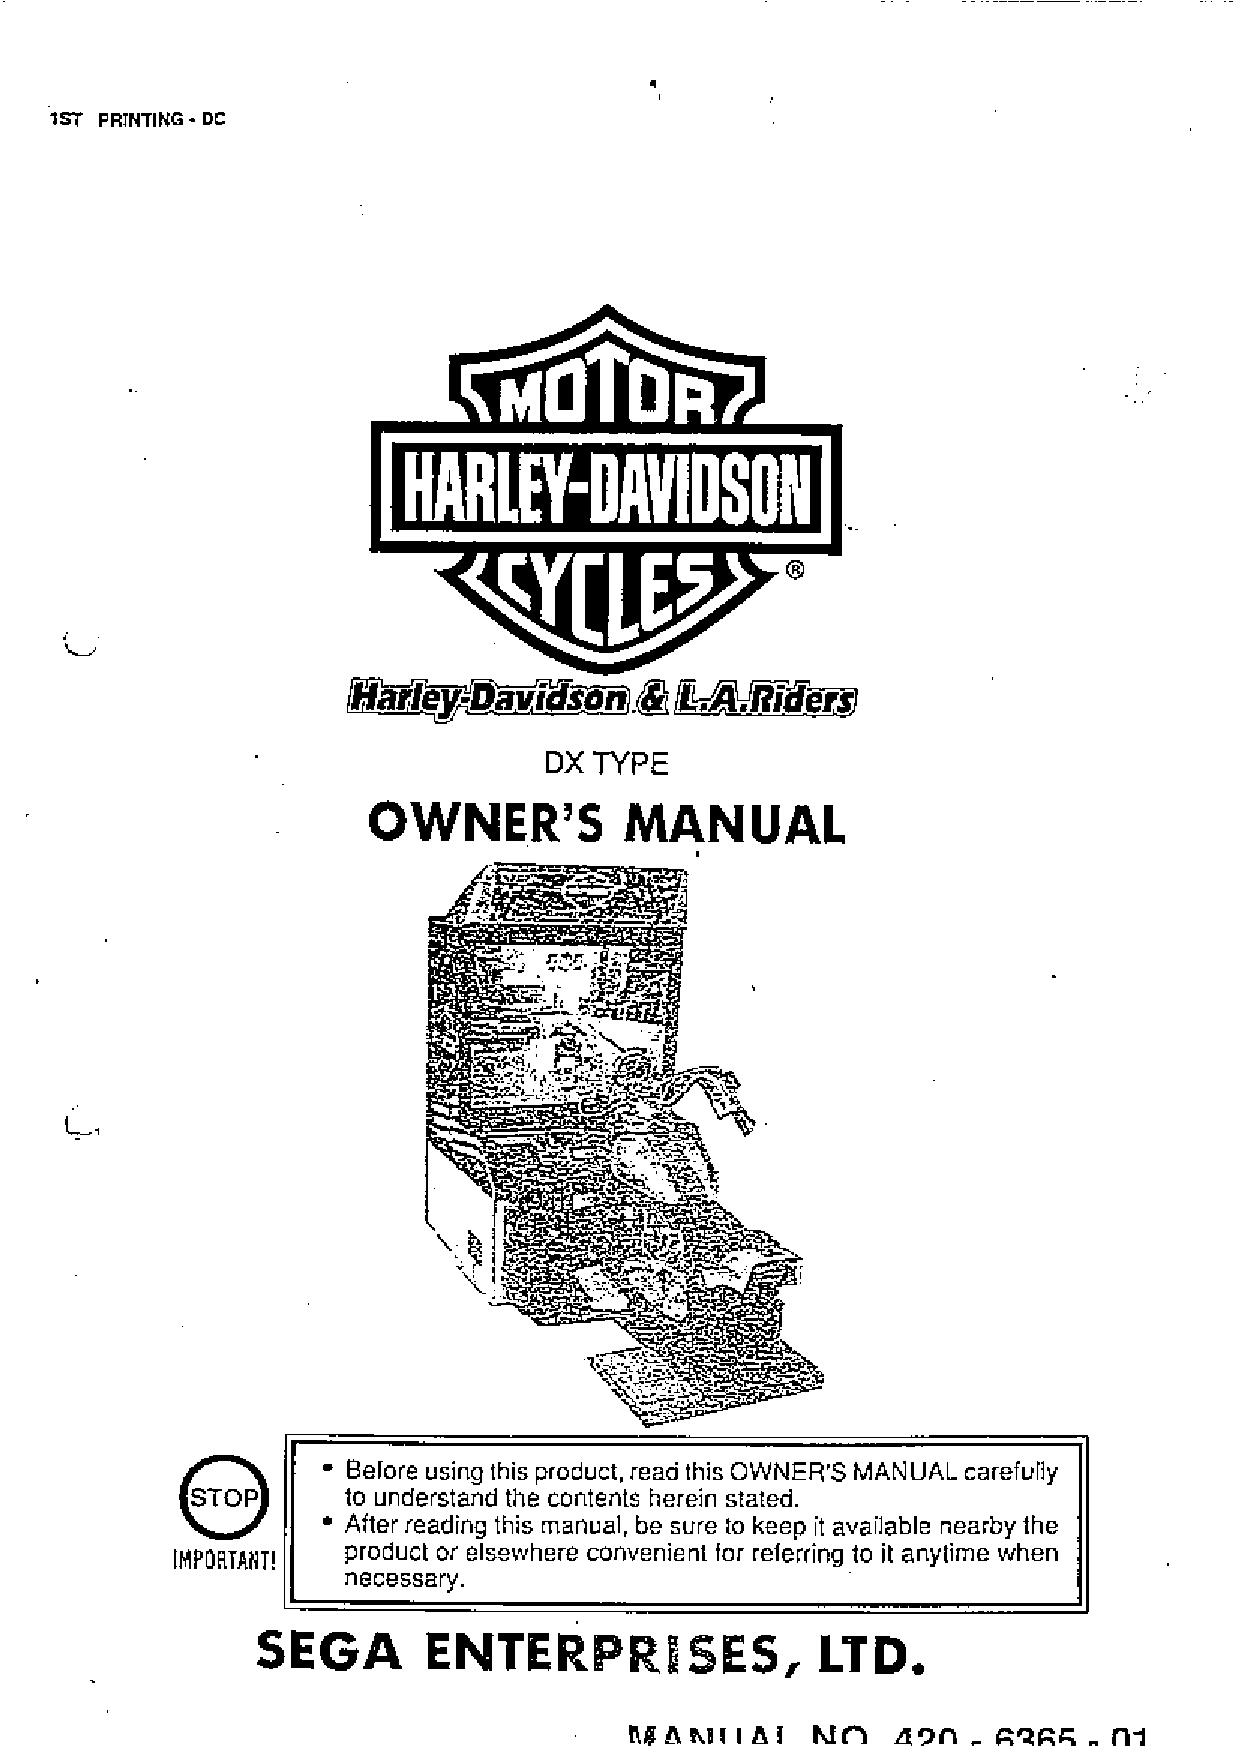 Harley Davidson DLX Manual 1797KB Nov 19 2013 09:24:57 AM